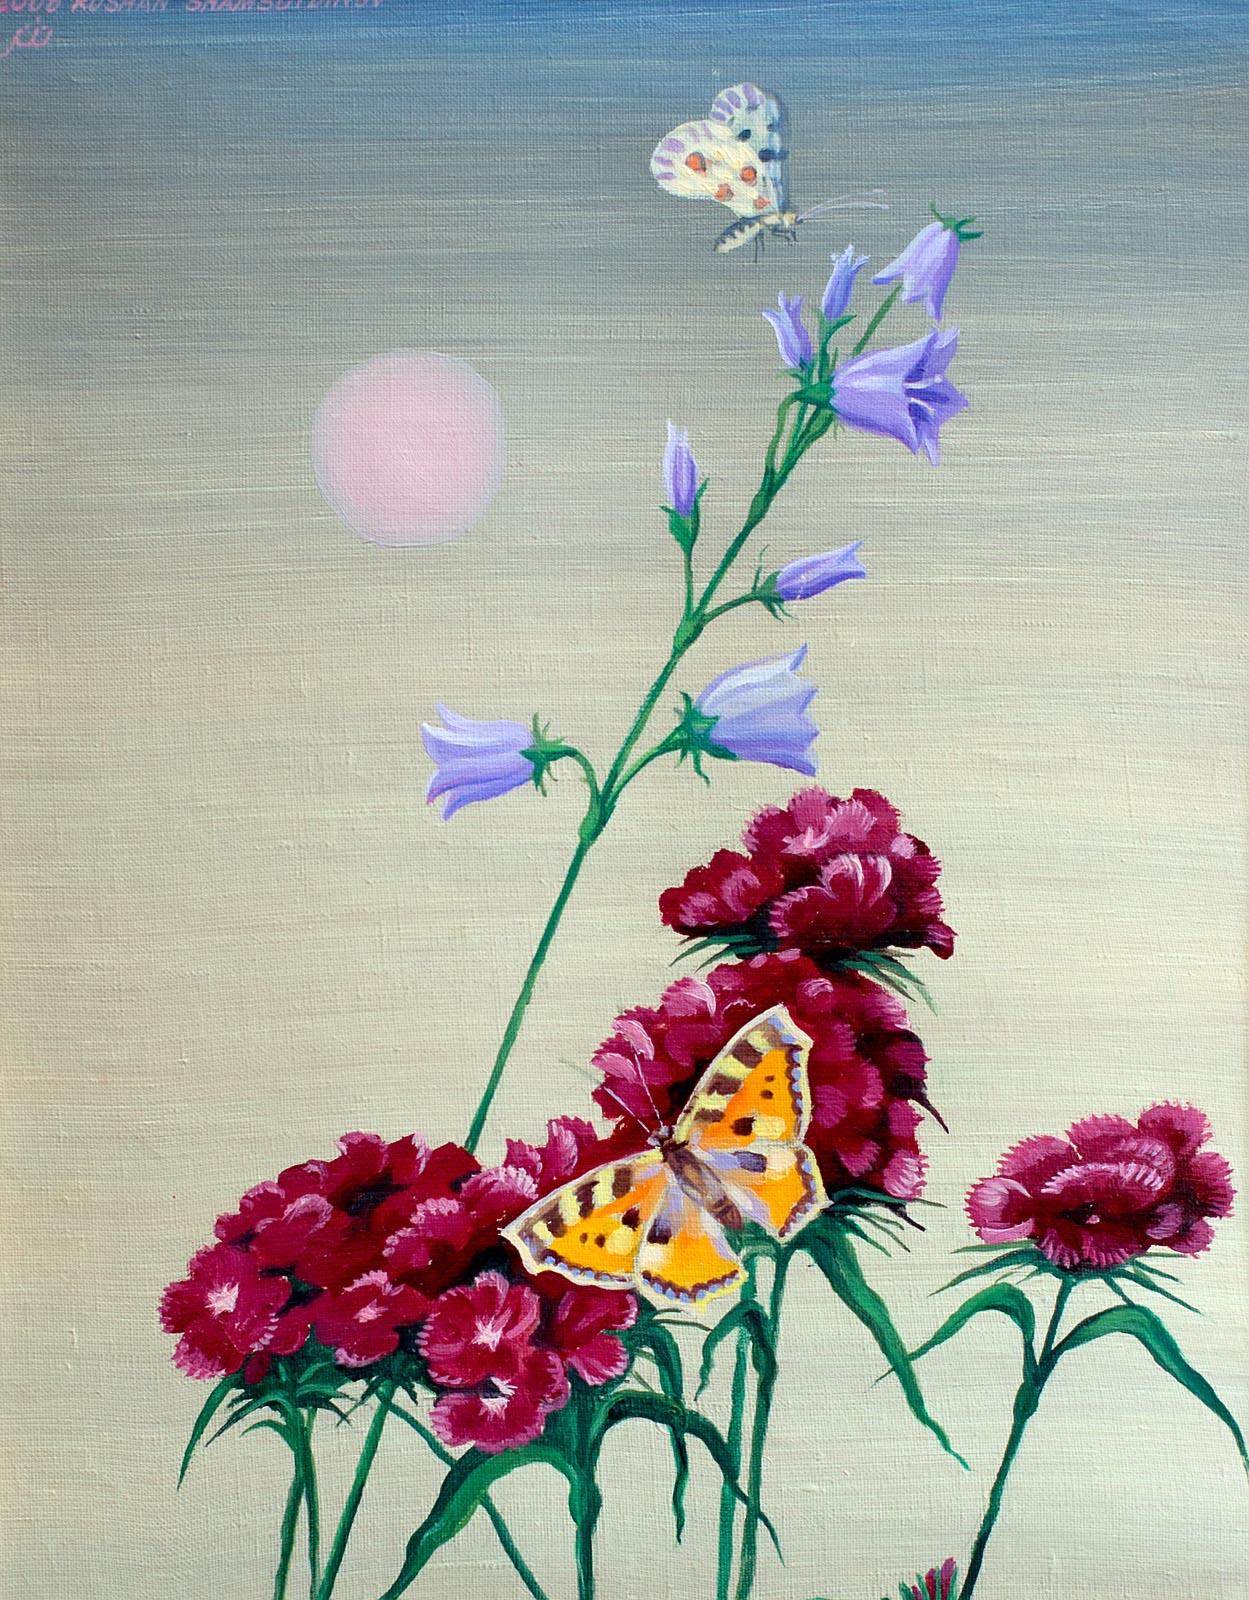 Фото №148048. Гвоздики и бабочки. 2006. Рушан Шамсутдинов